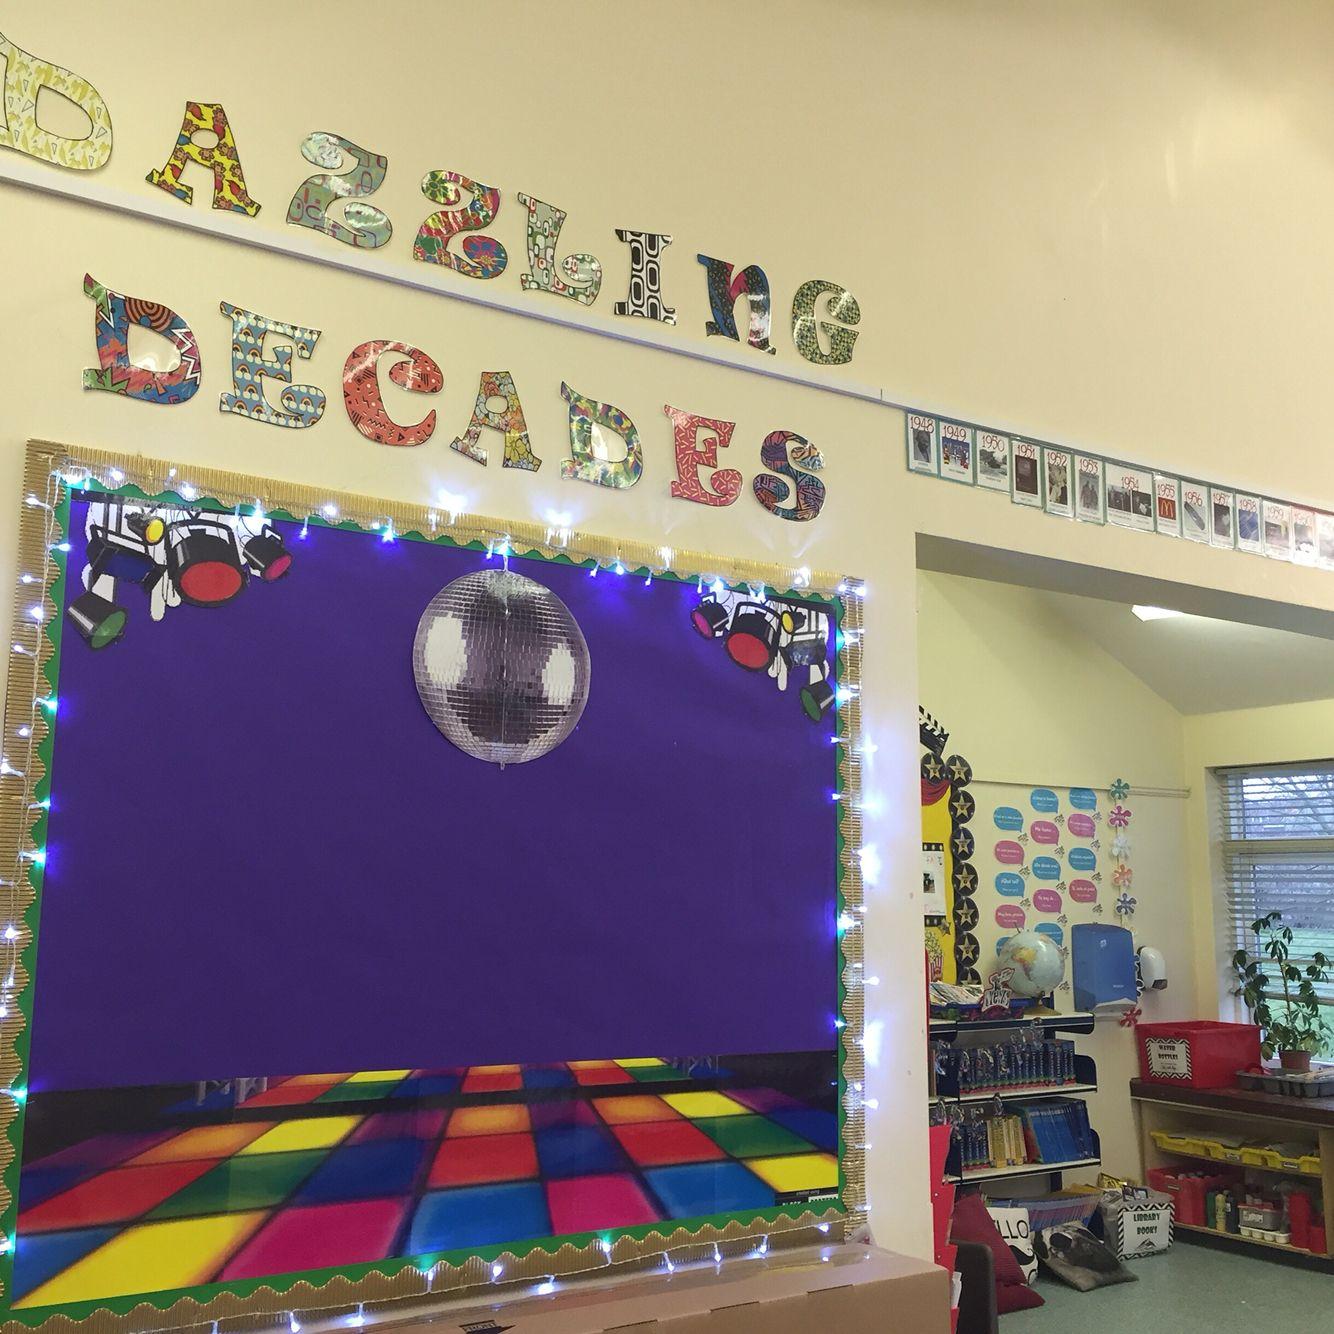 Classroom Display Board Design : Dazzling decades classroom display board my